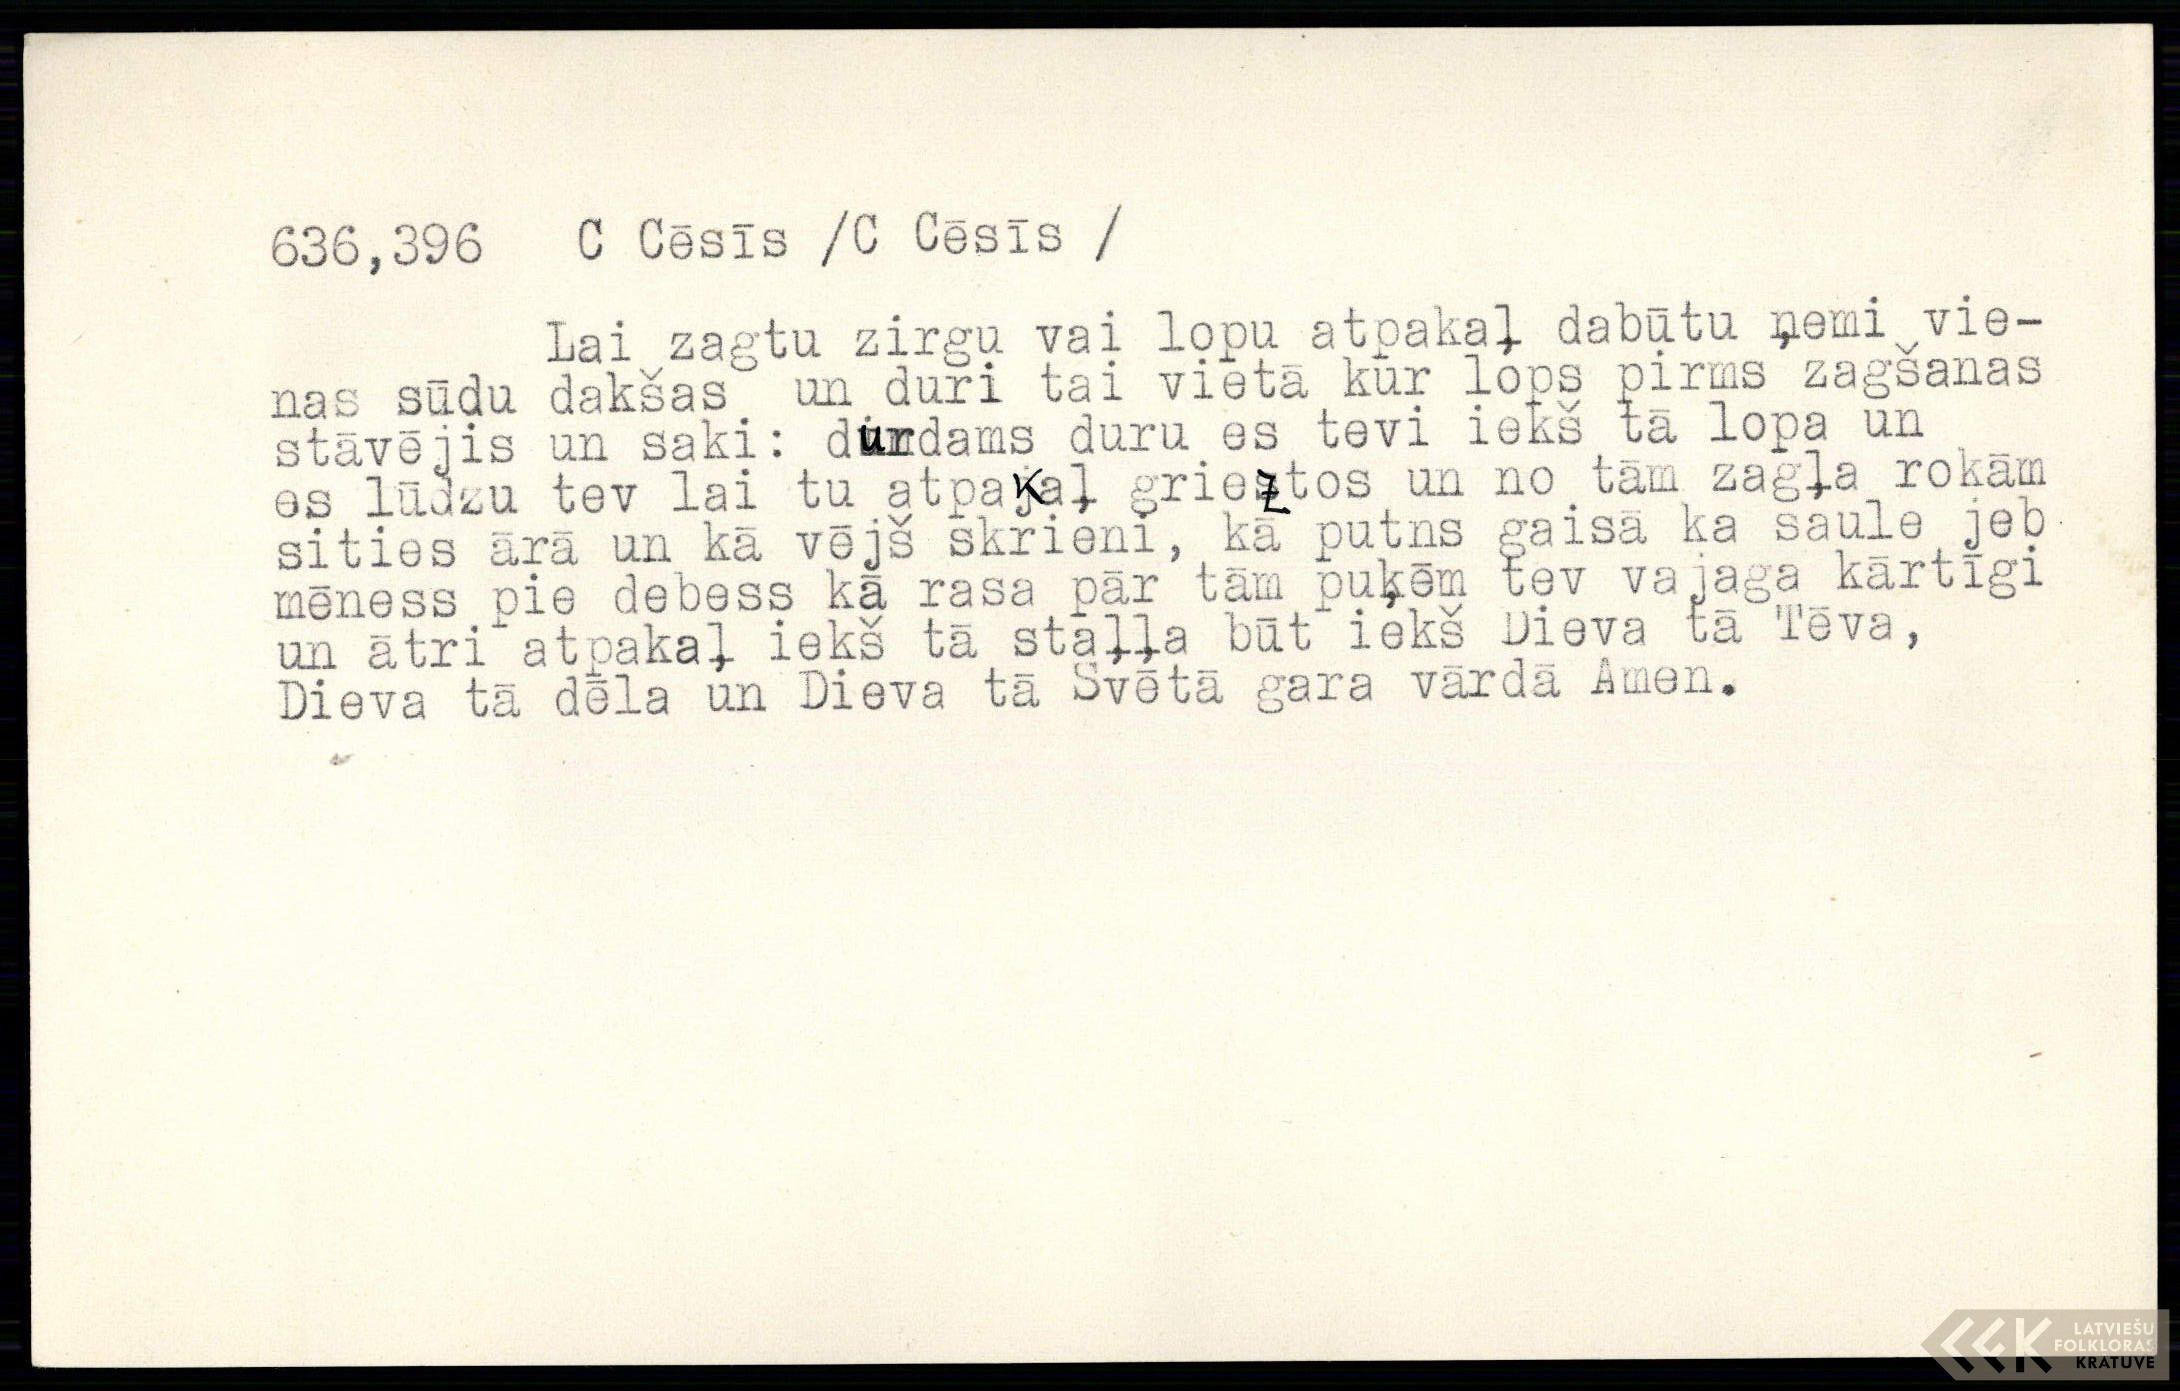 LFK-0636-00396-buramvardu-kartoteka